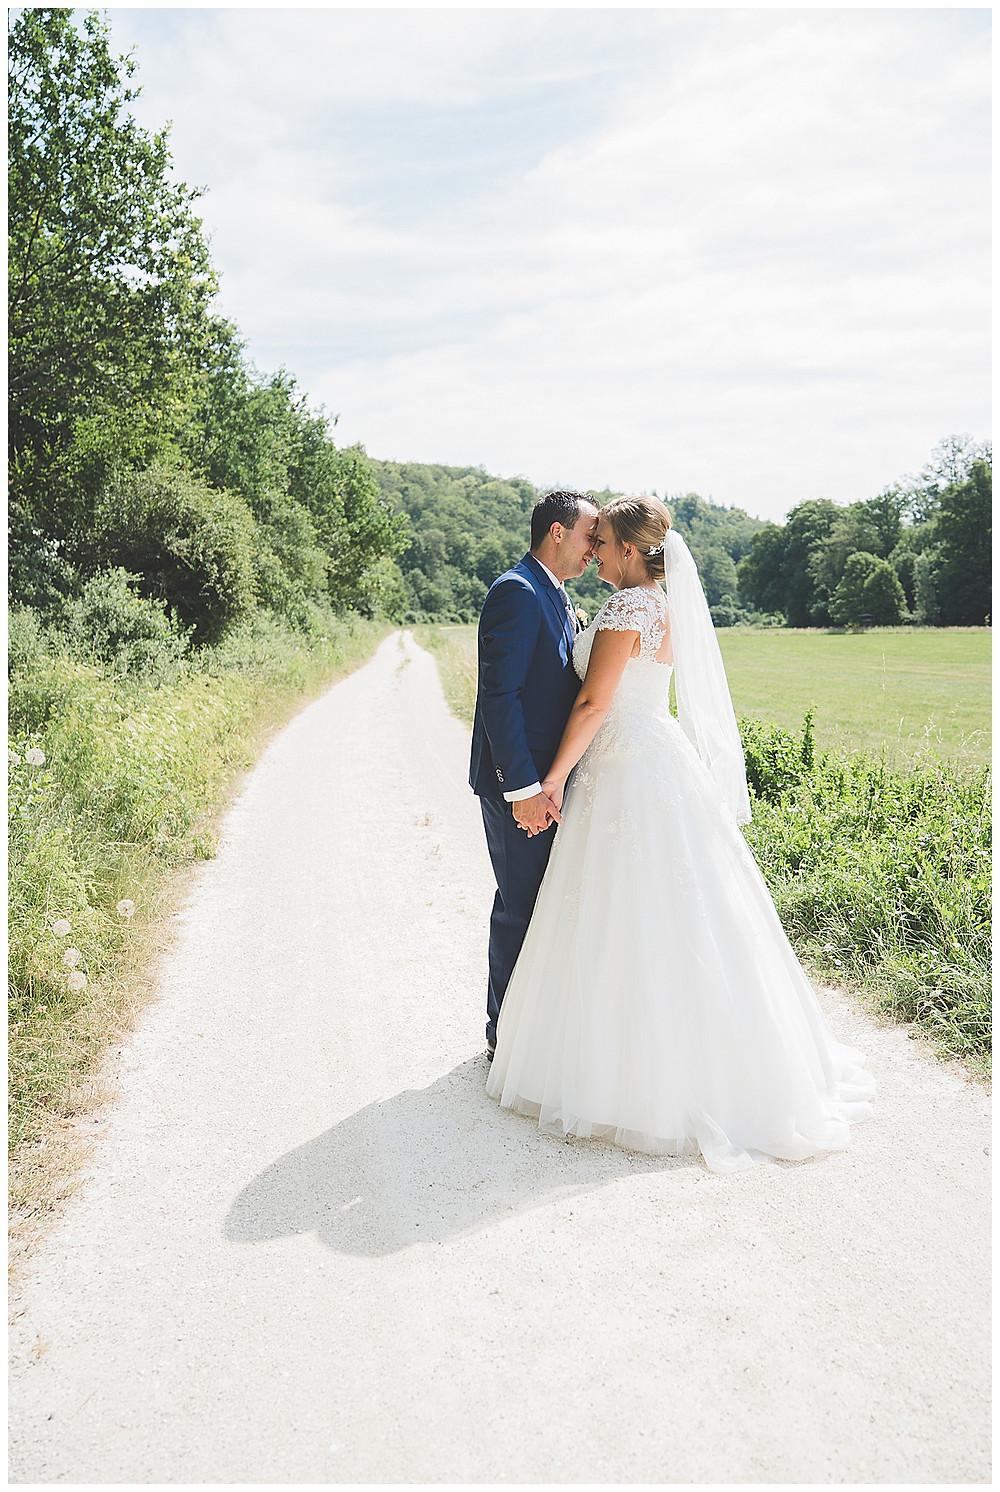 Brautpaarfotos im Lonetal